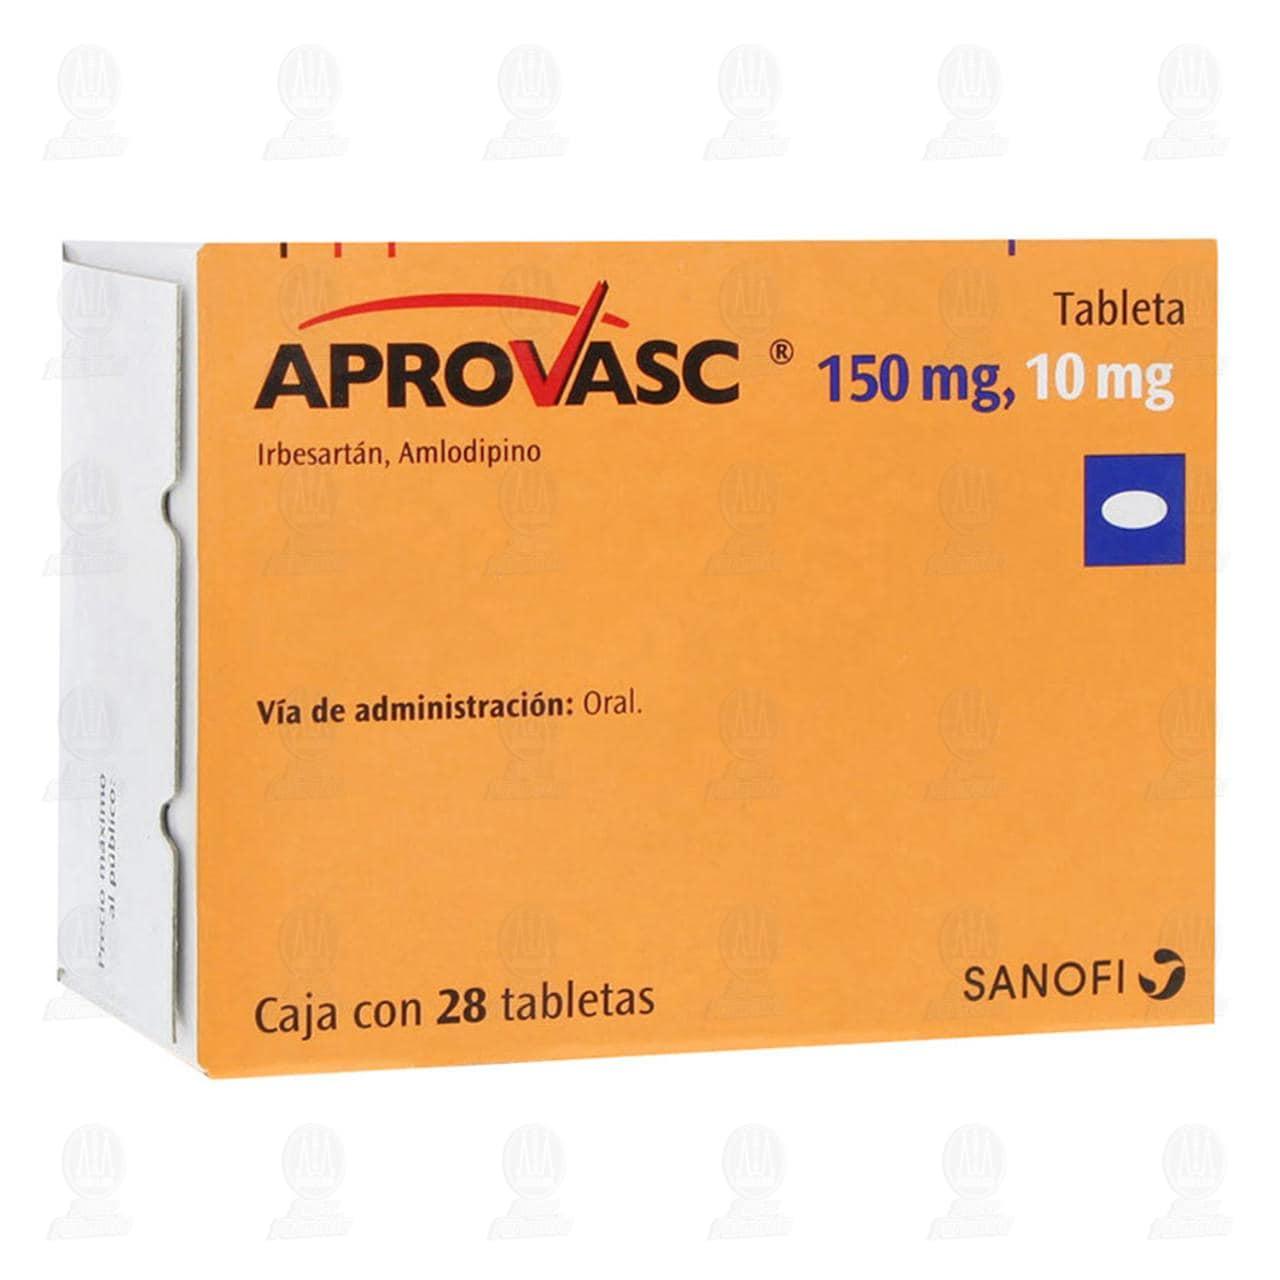 Comprar Aprovasc 150mg/10mg 28 Tabletas en Farmacias Guadalajara